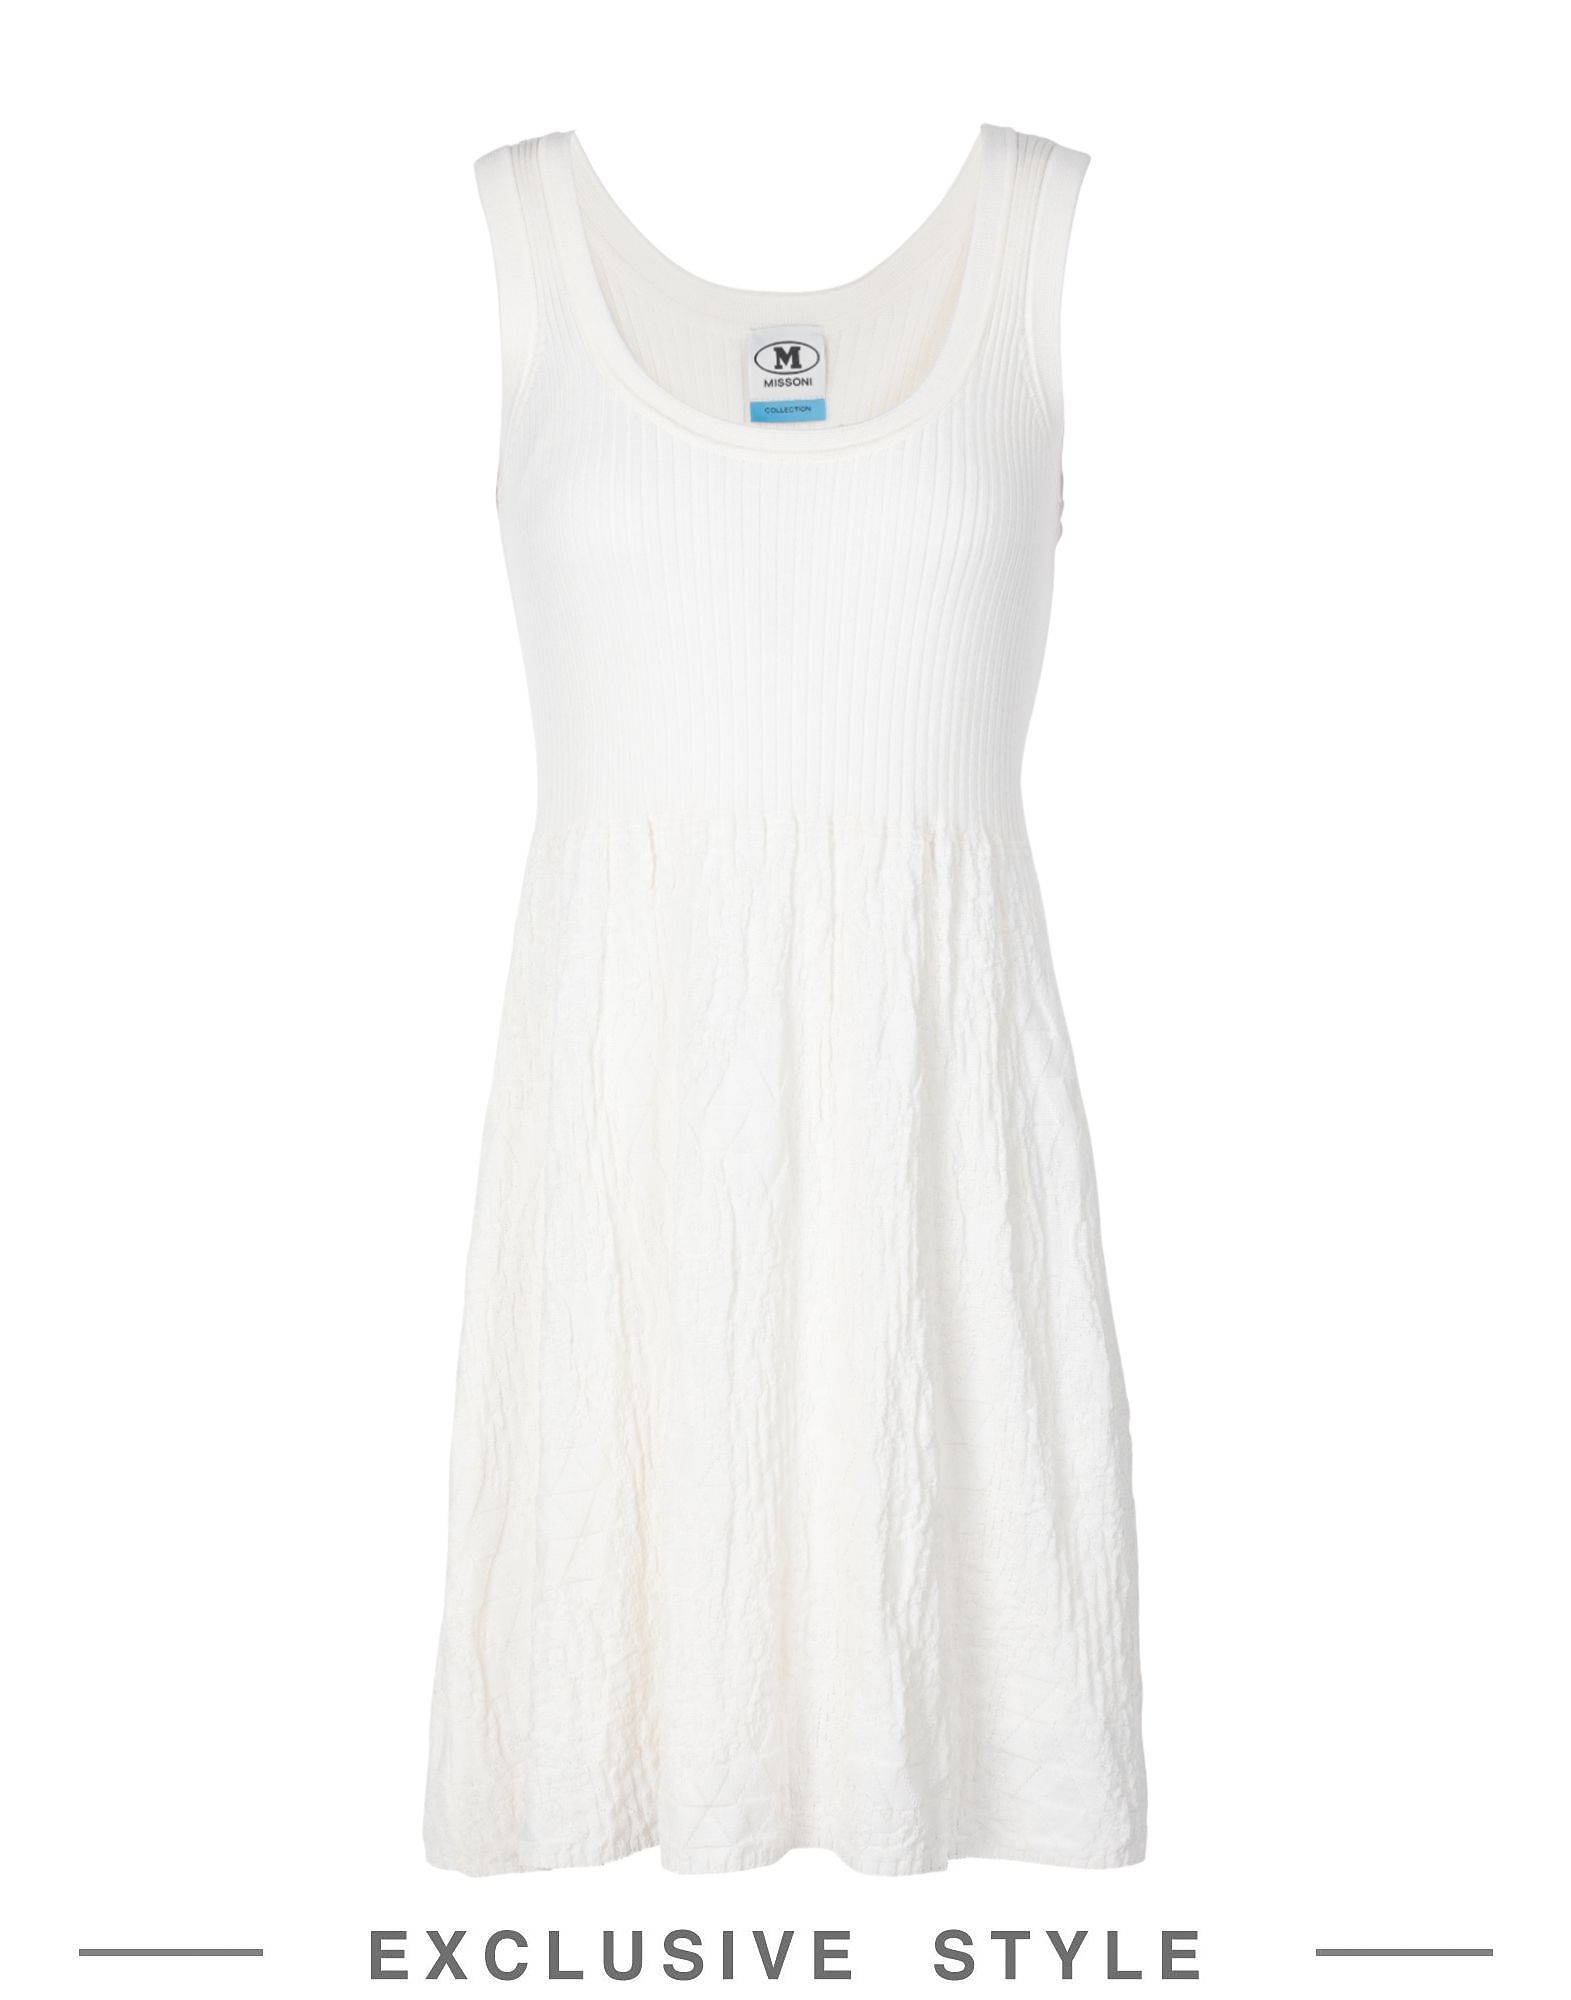 m missoni x yoox футболка M MISSONI x YOOX Короткое платье